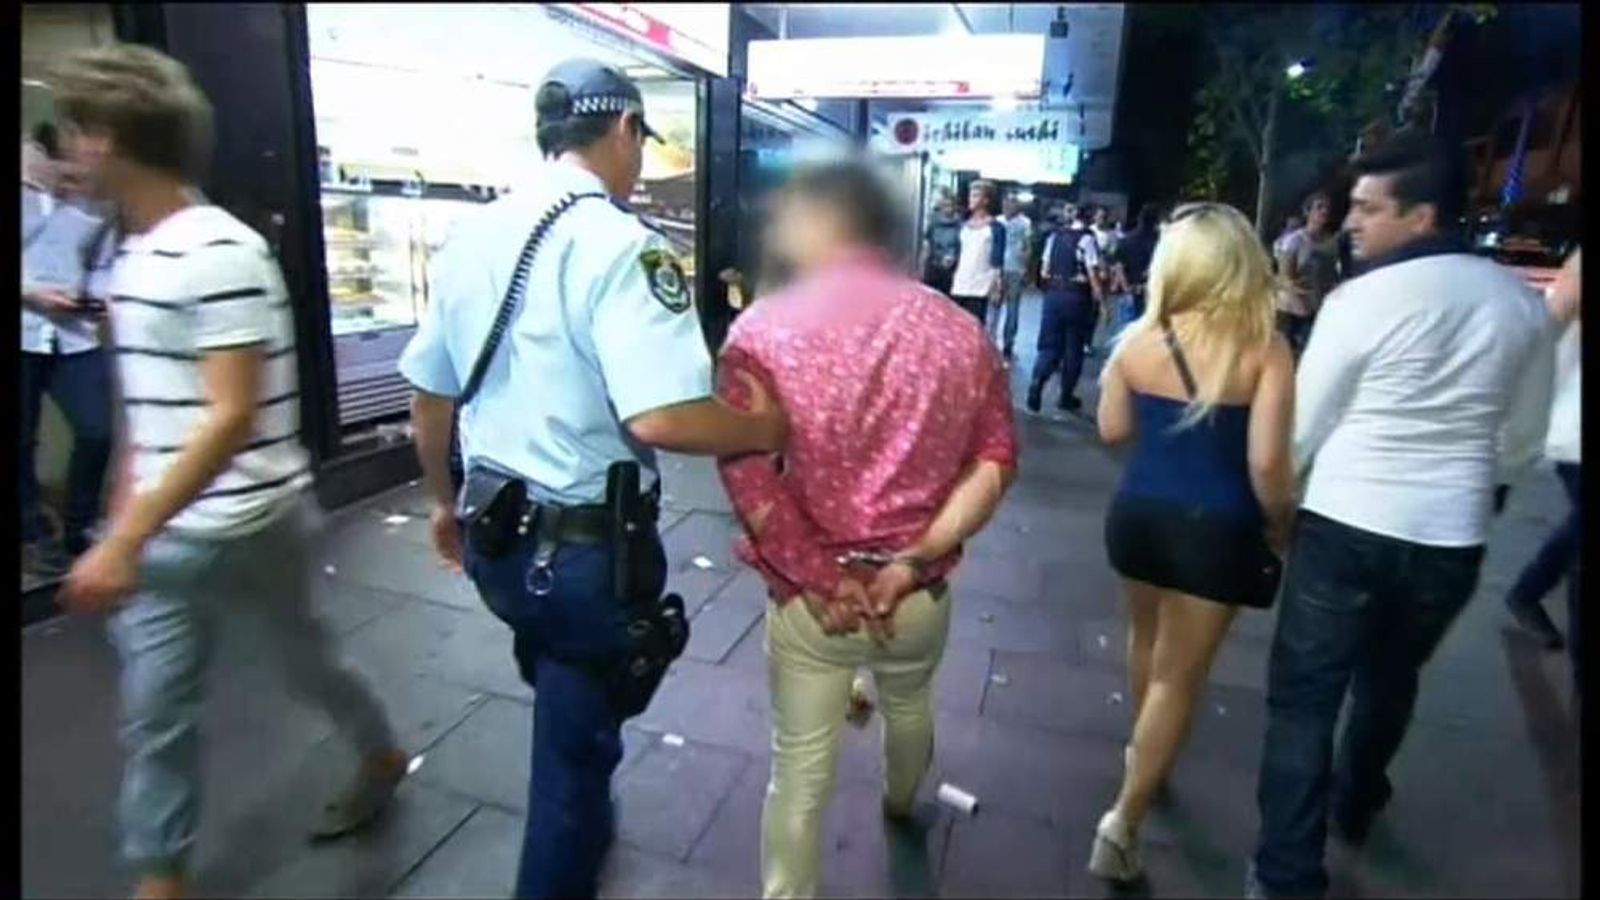 Alcohol violence in Australia